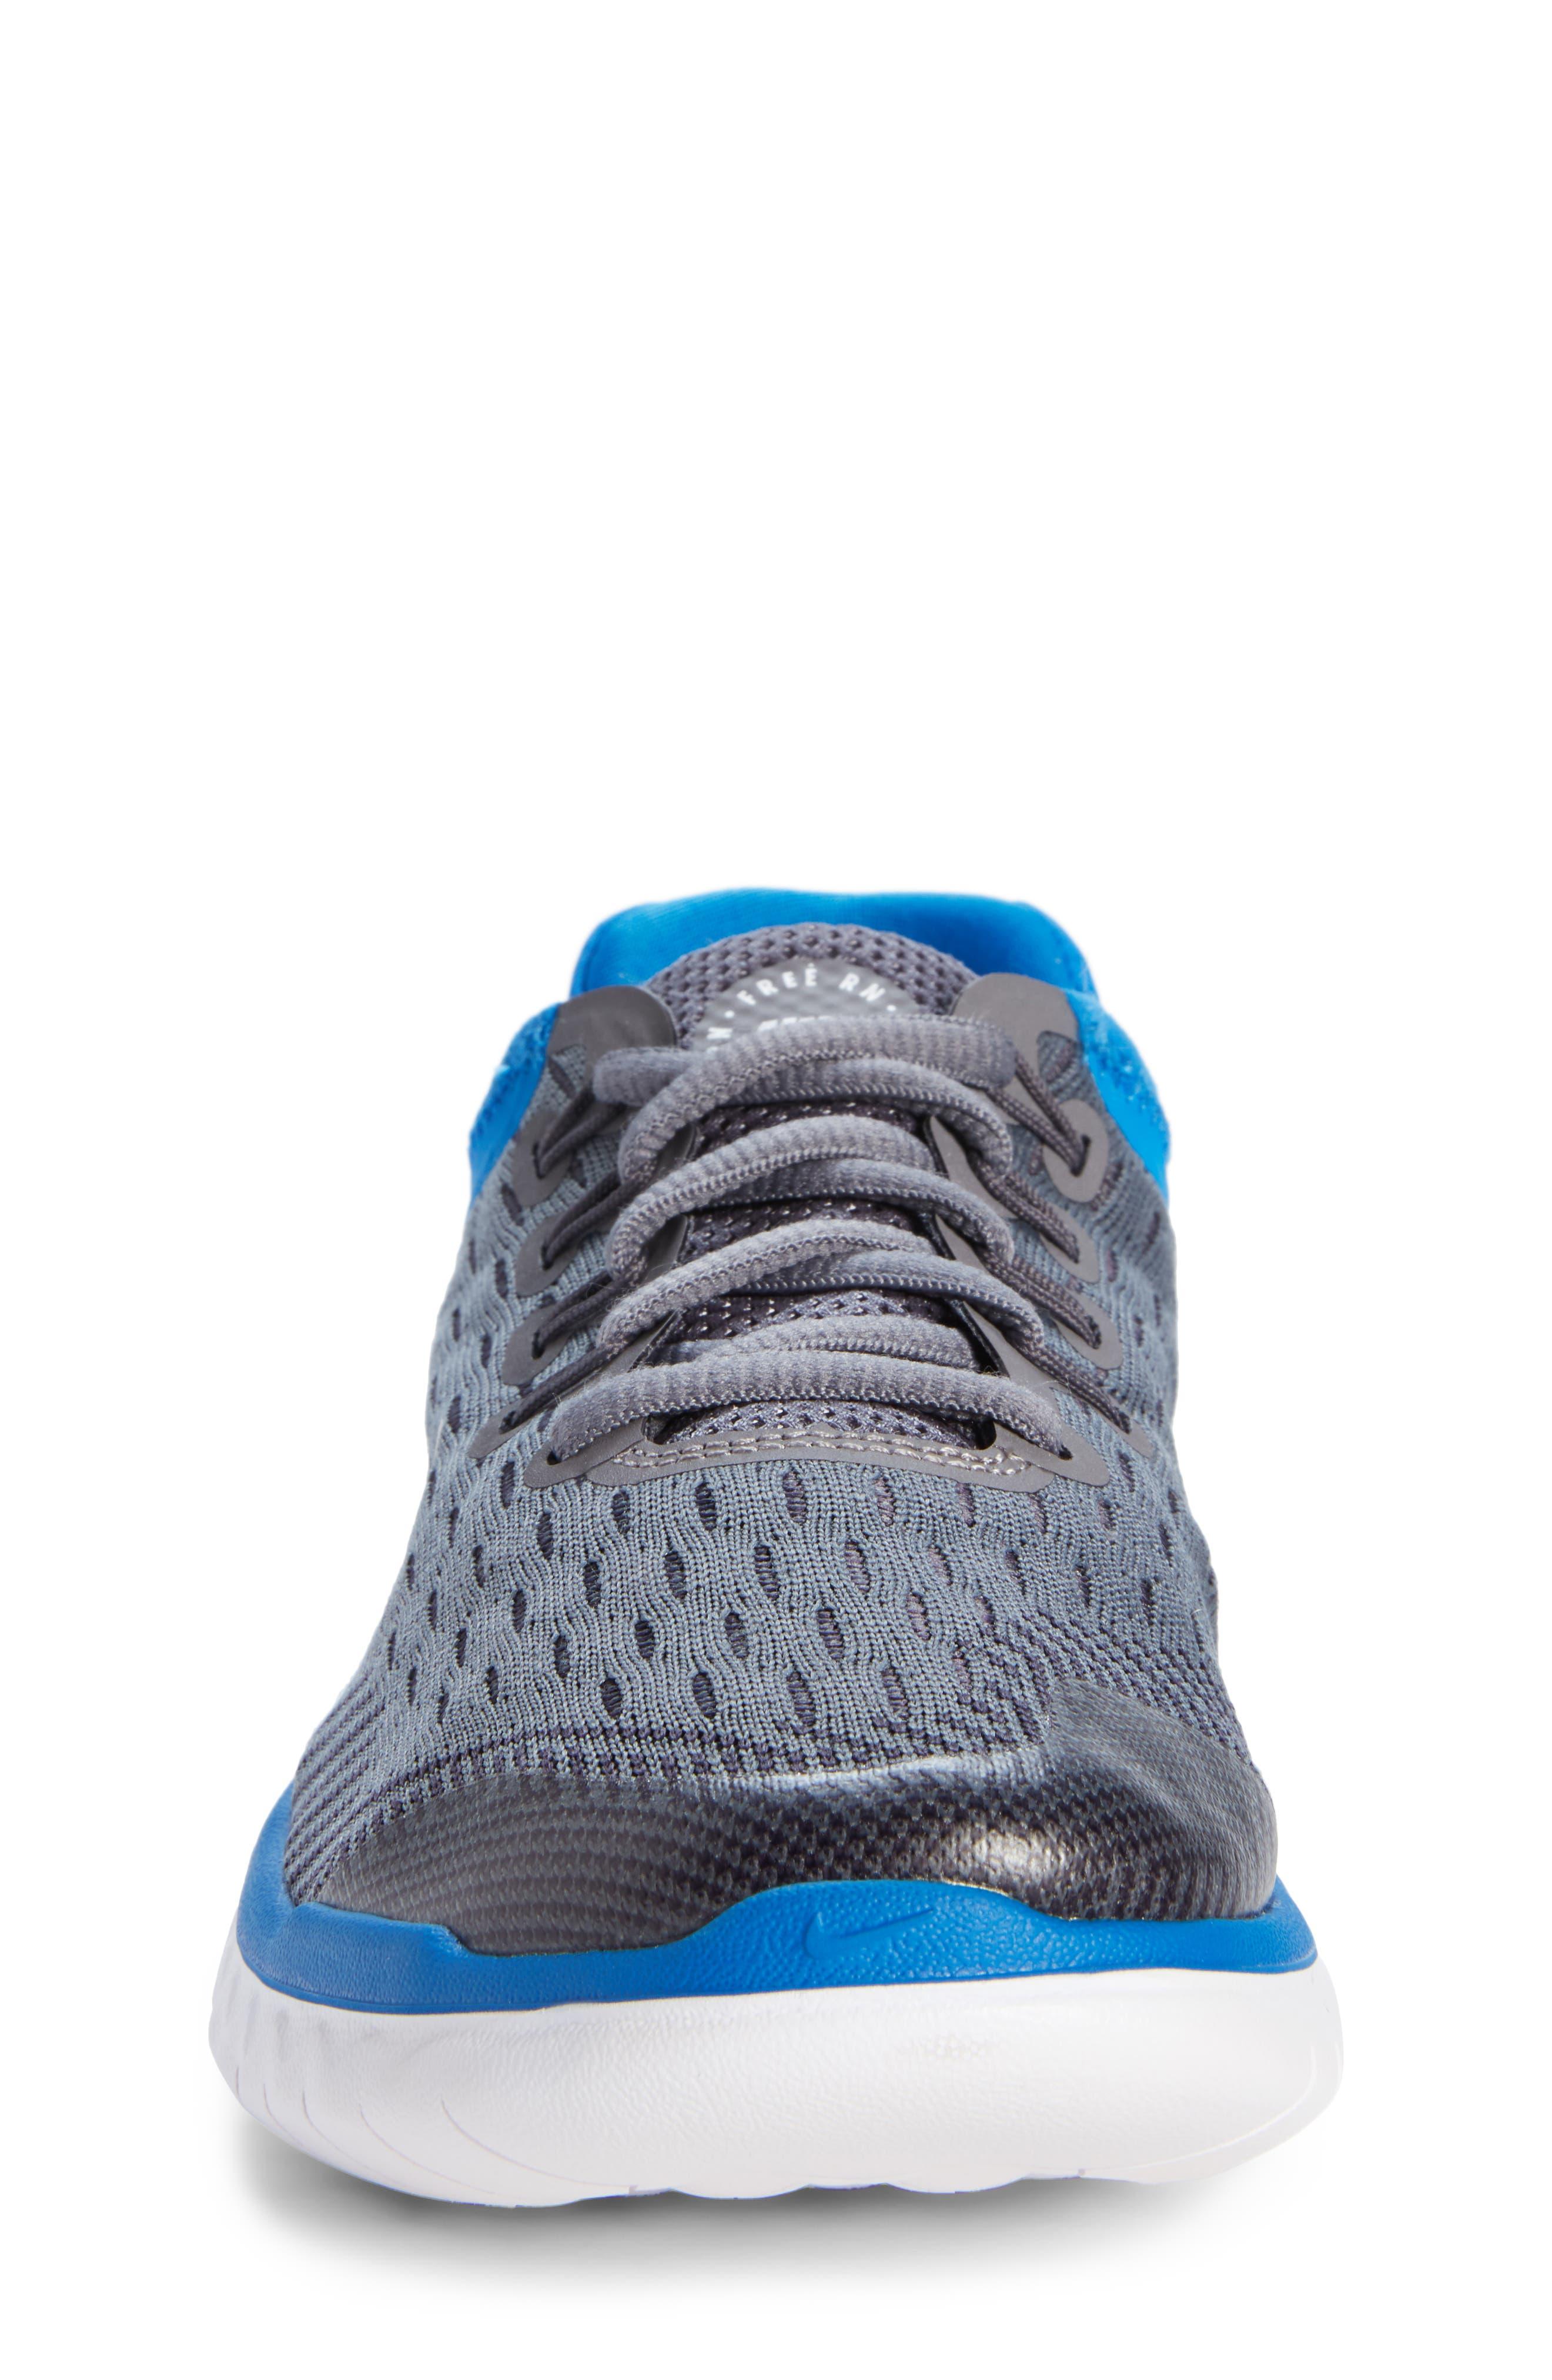 Free RN 2018 Running Shoe,                             Alternate thumbnail 4, color,                             GREY/WHITE/BLUE